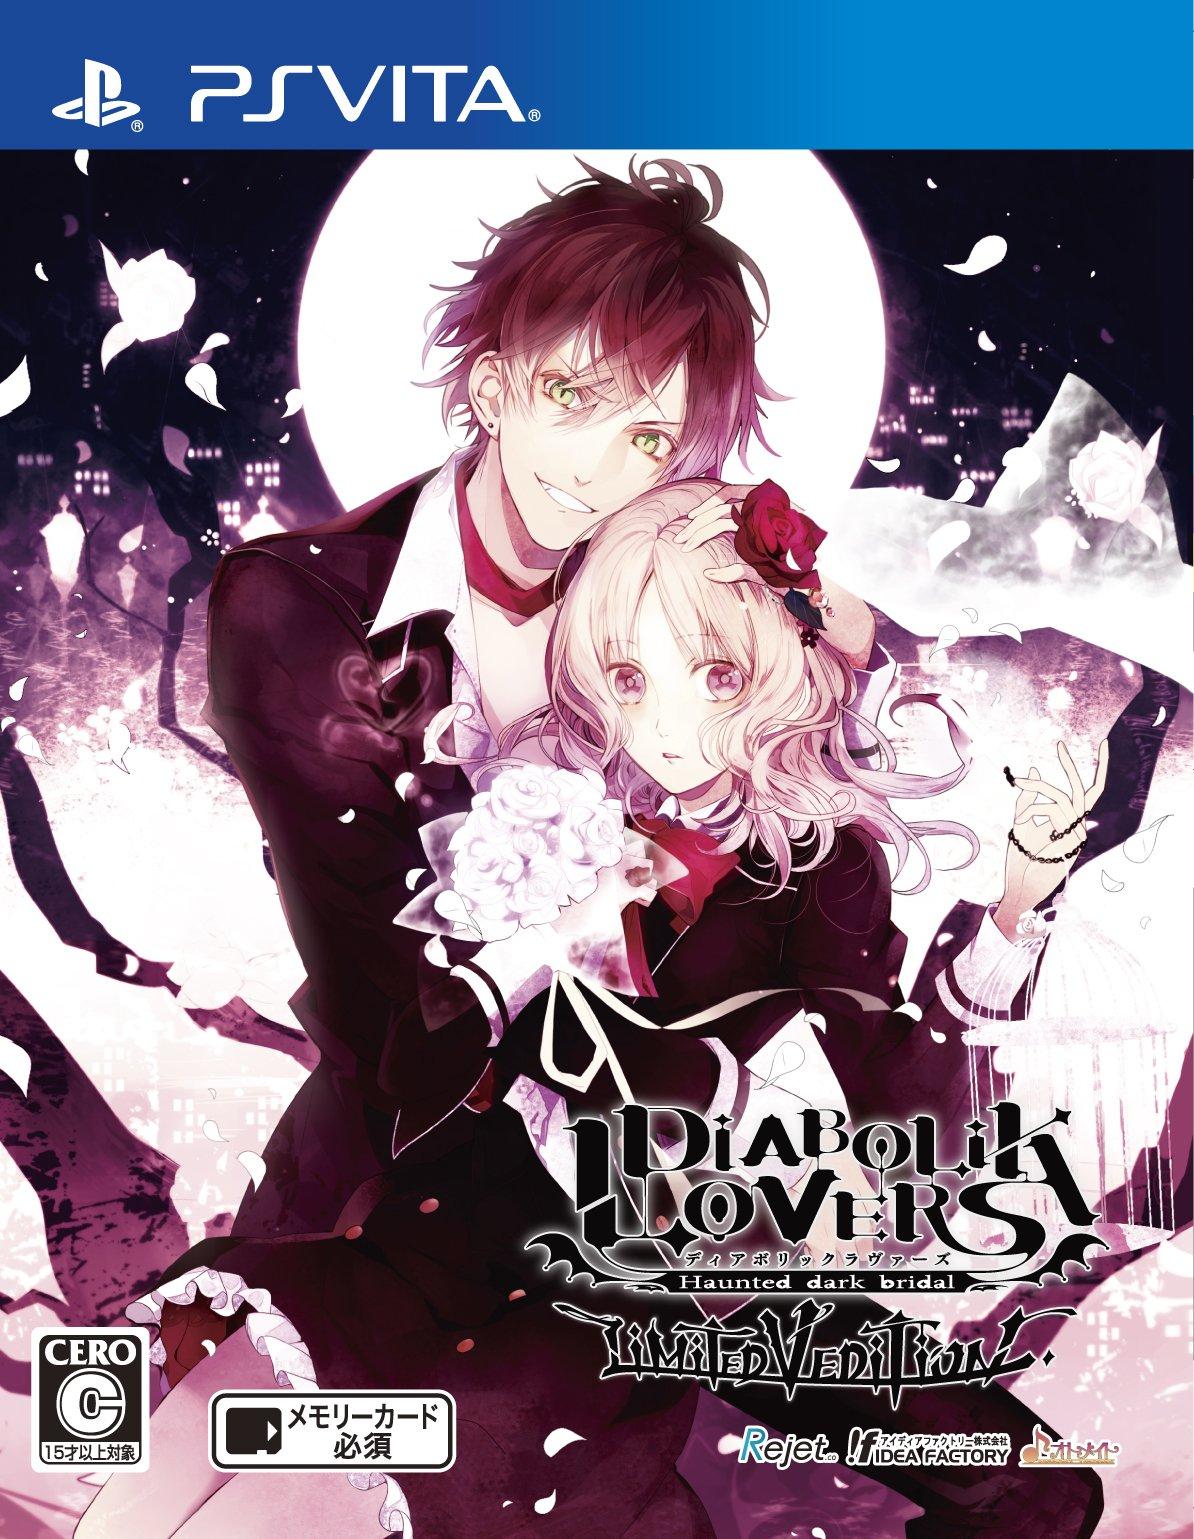 Diabolik Lovers limited V edition